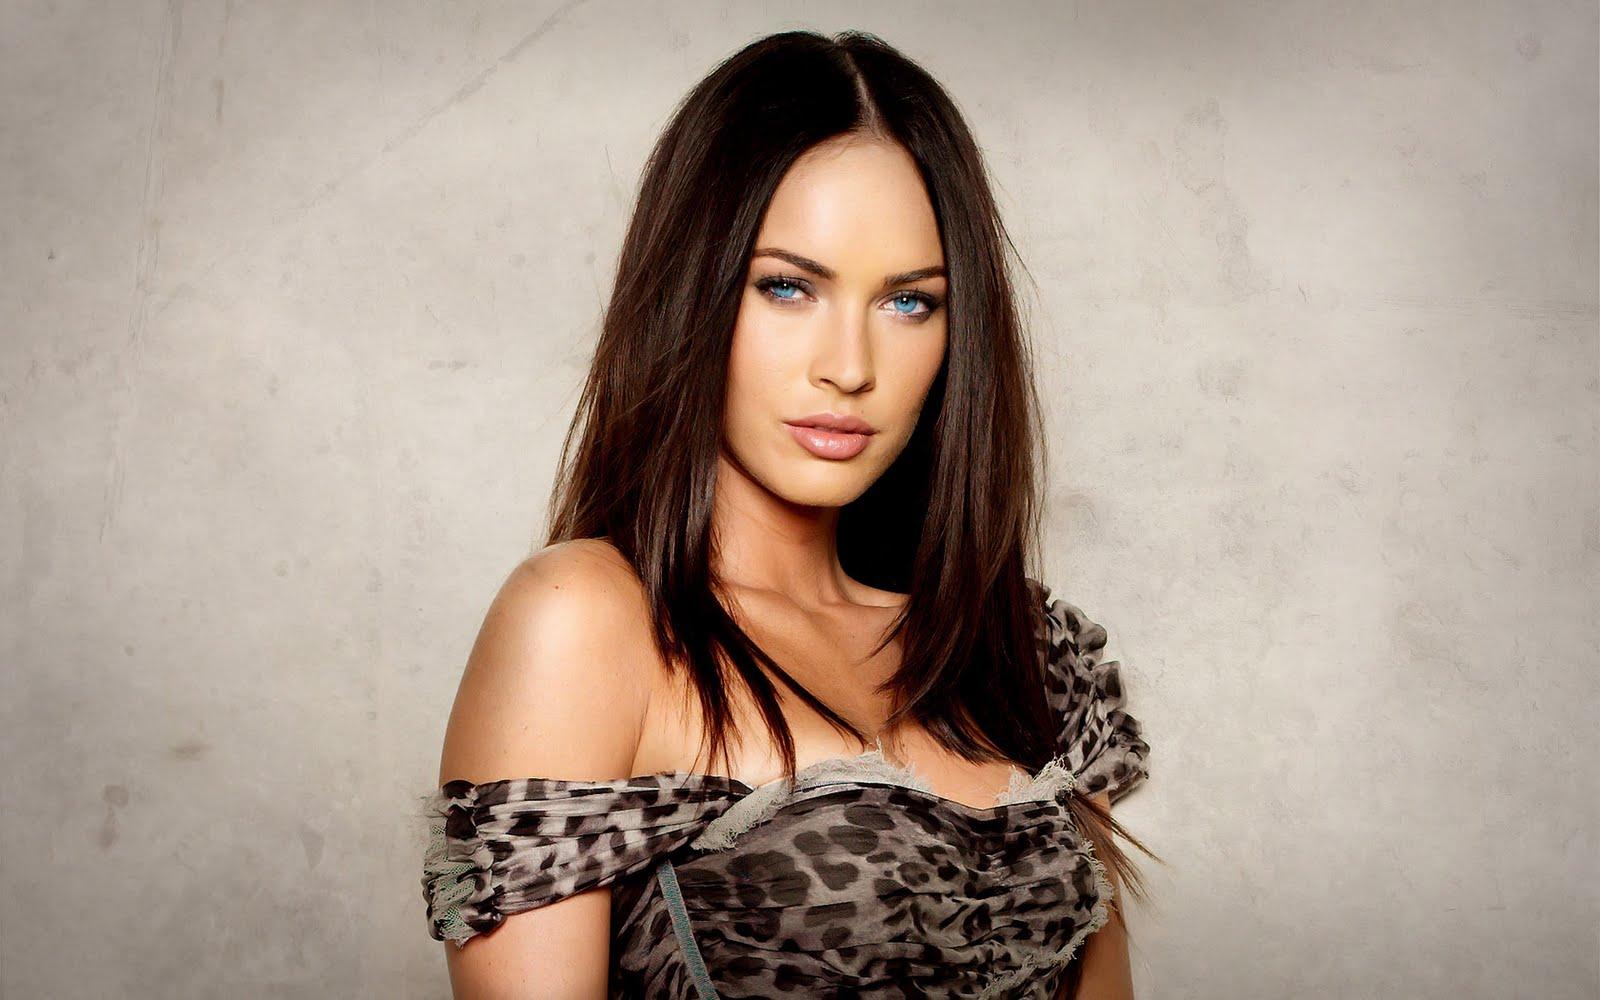 http://4.bp.blogspot.com/-2_KK1uxJlXo/TffBf1plvjI/AAAAAAAAB6g/yjAnoan-9h0/s1600/Megan+Fox+Sensual+Lips+Blue+Eyes+Full+HD+Wallpaper.jpg